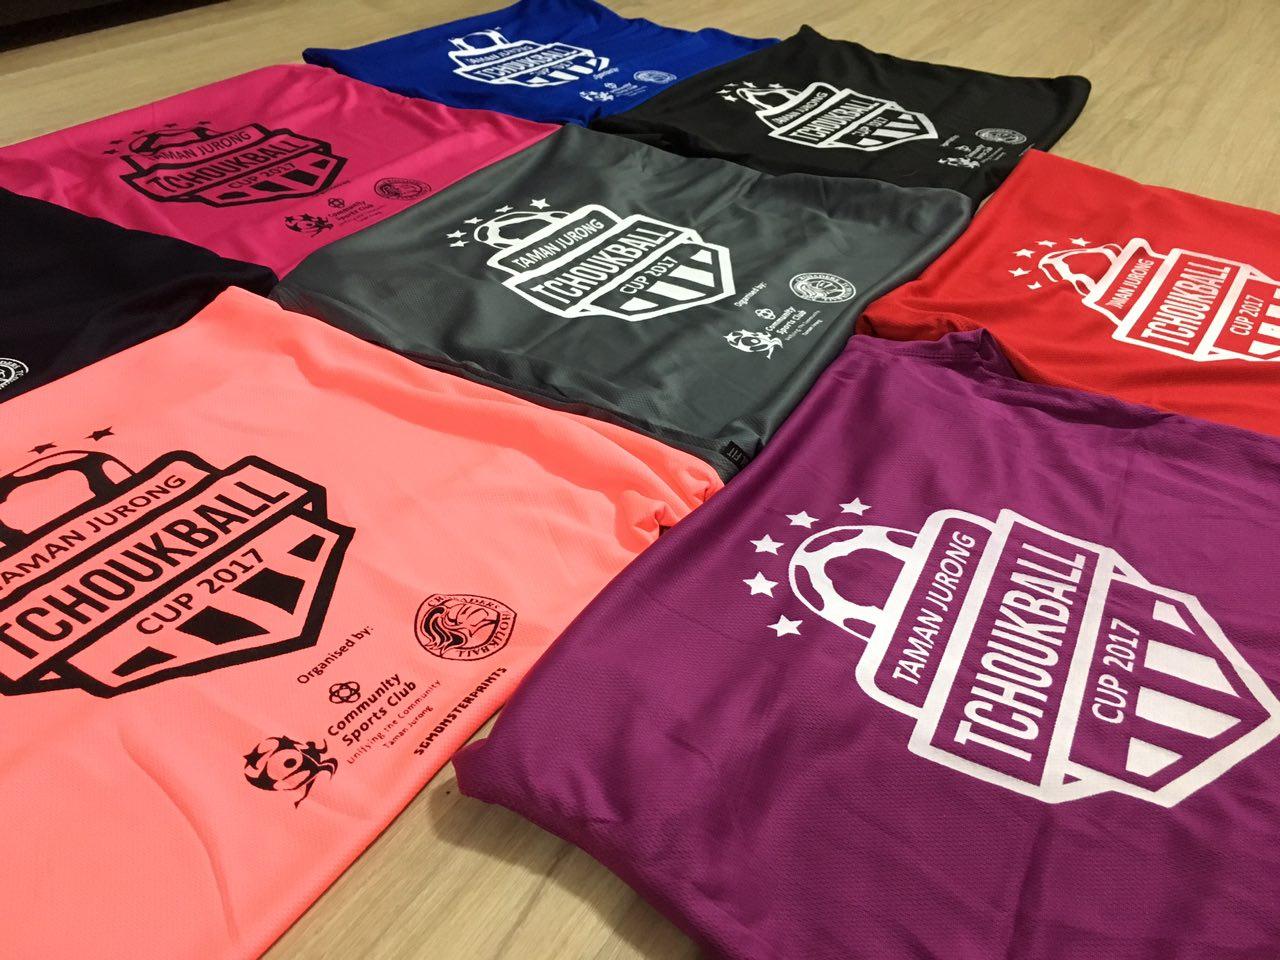 Silkscreen T Shirts Being Printed